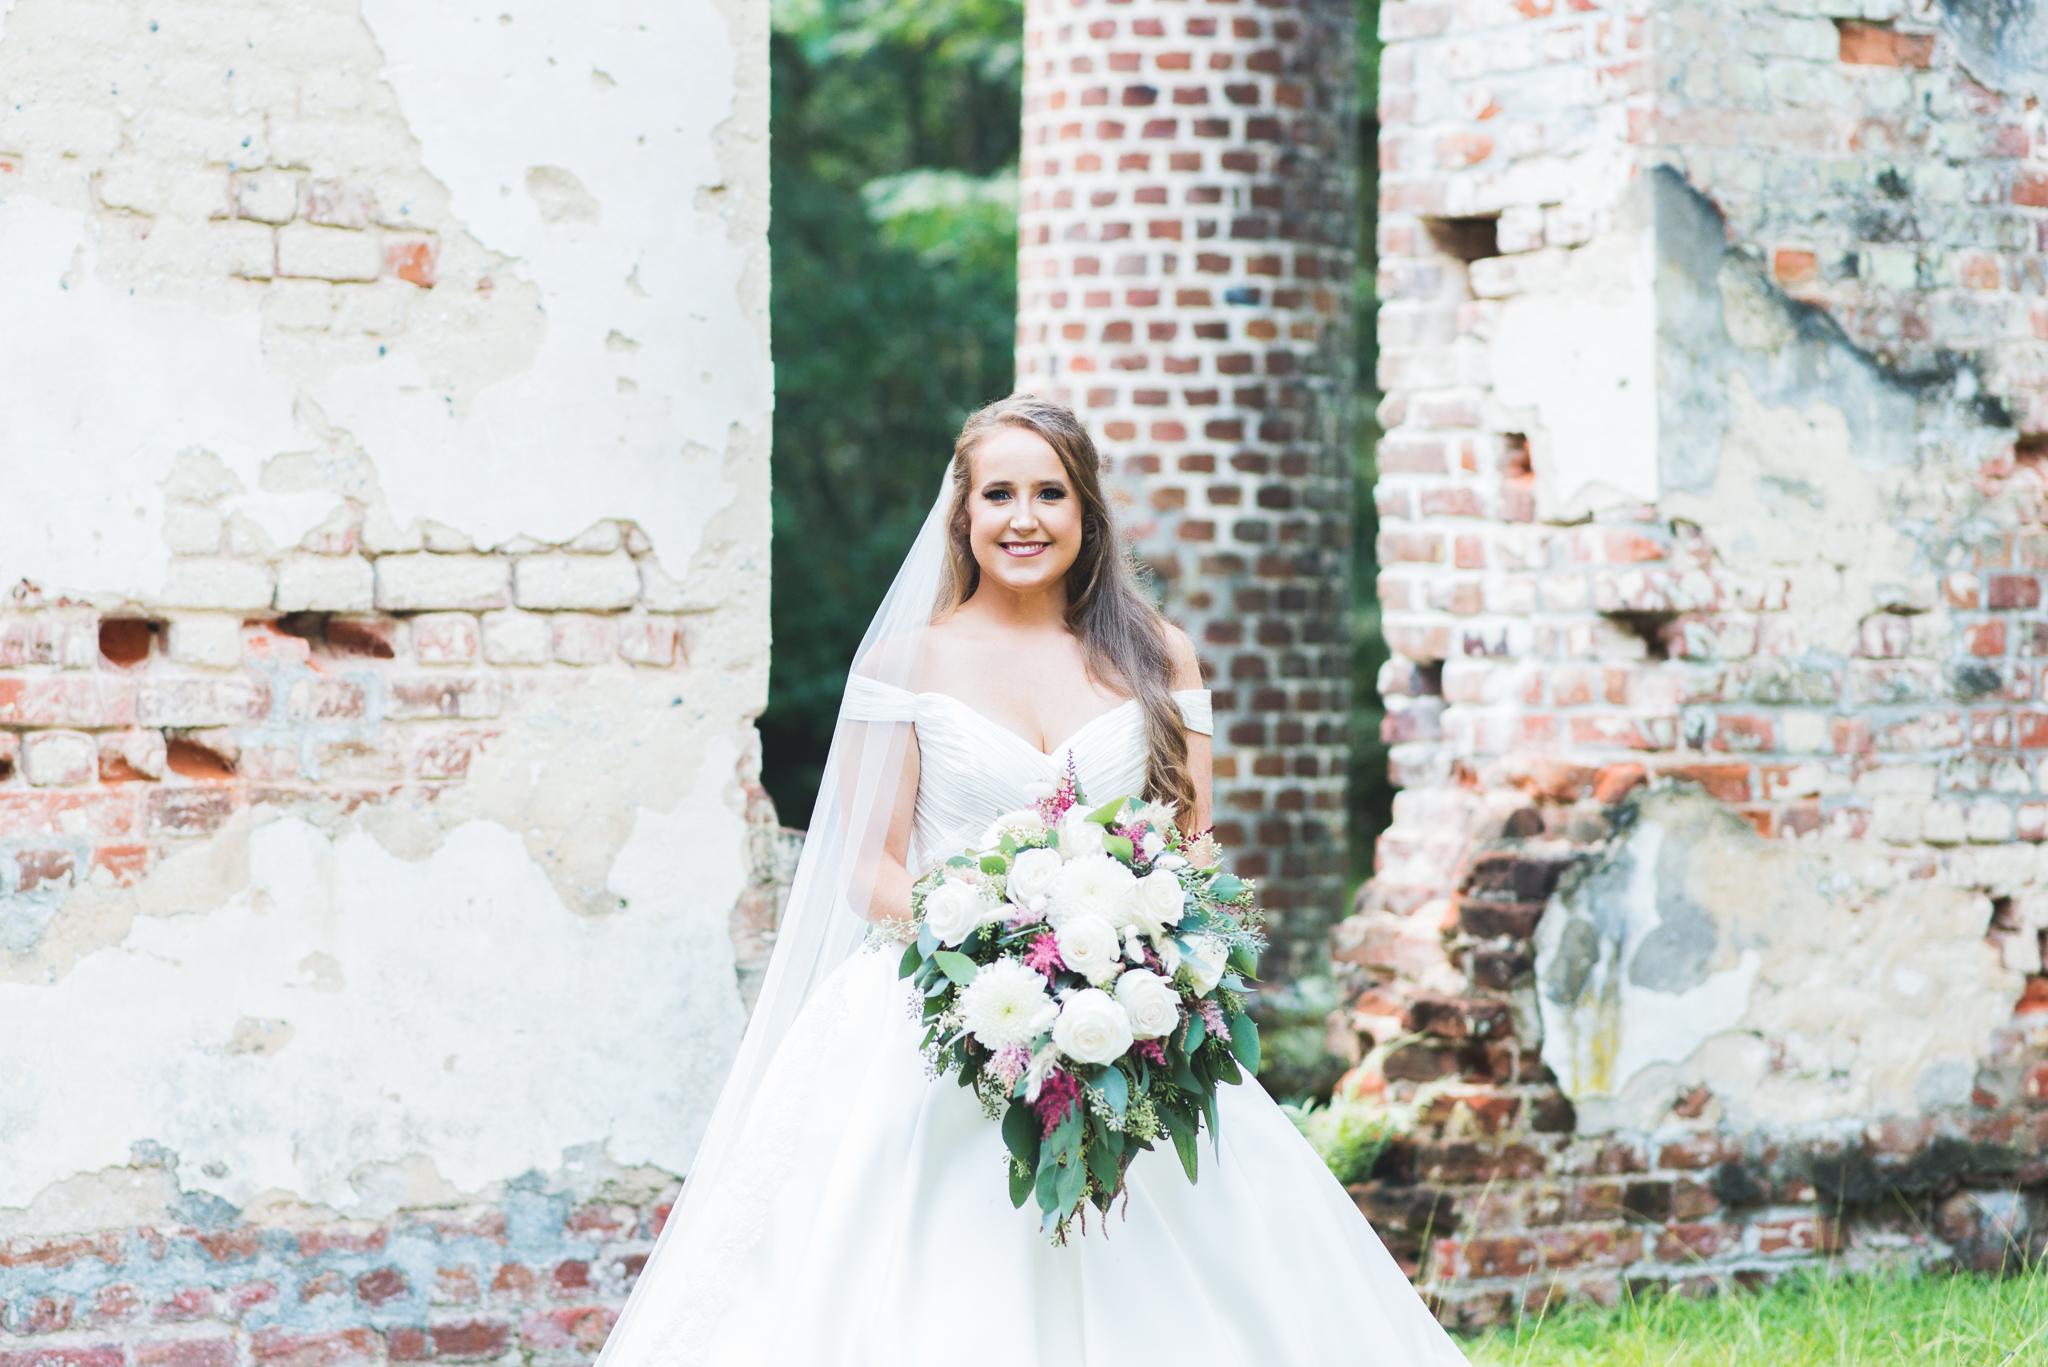 Bridals_AmberRay_blog-9.jpg